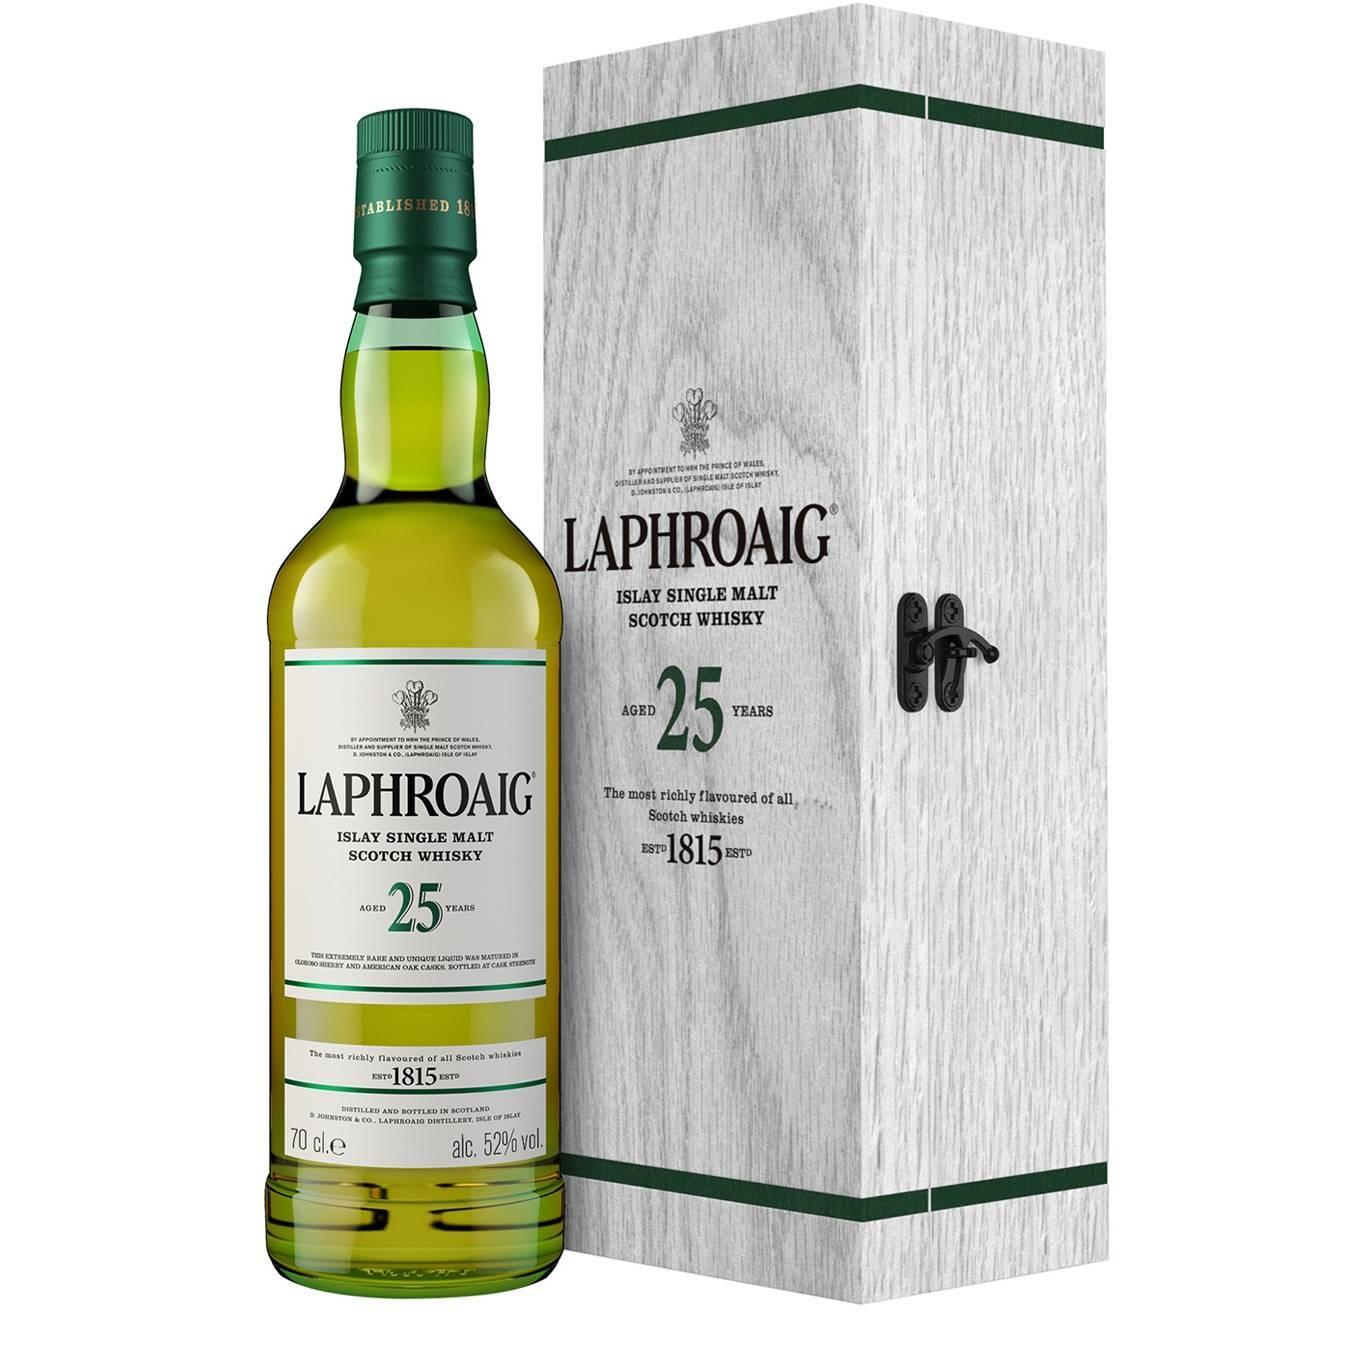 Виски laphroaig malt 10 years old, with box — купить лафройг, 10 лет, в коробке в москве, цена 6120 руб.